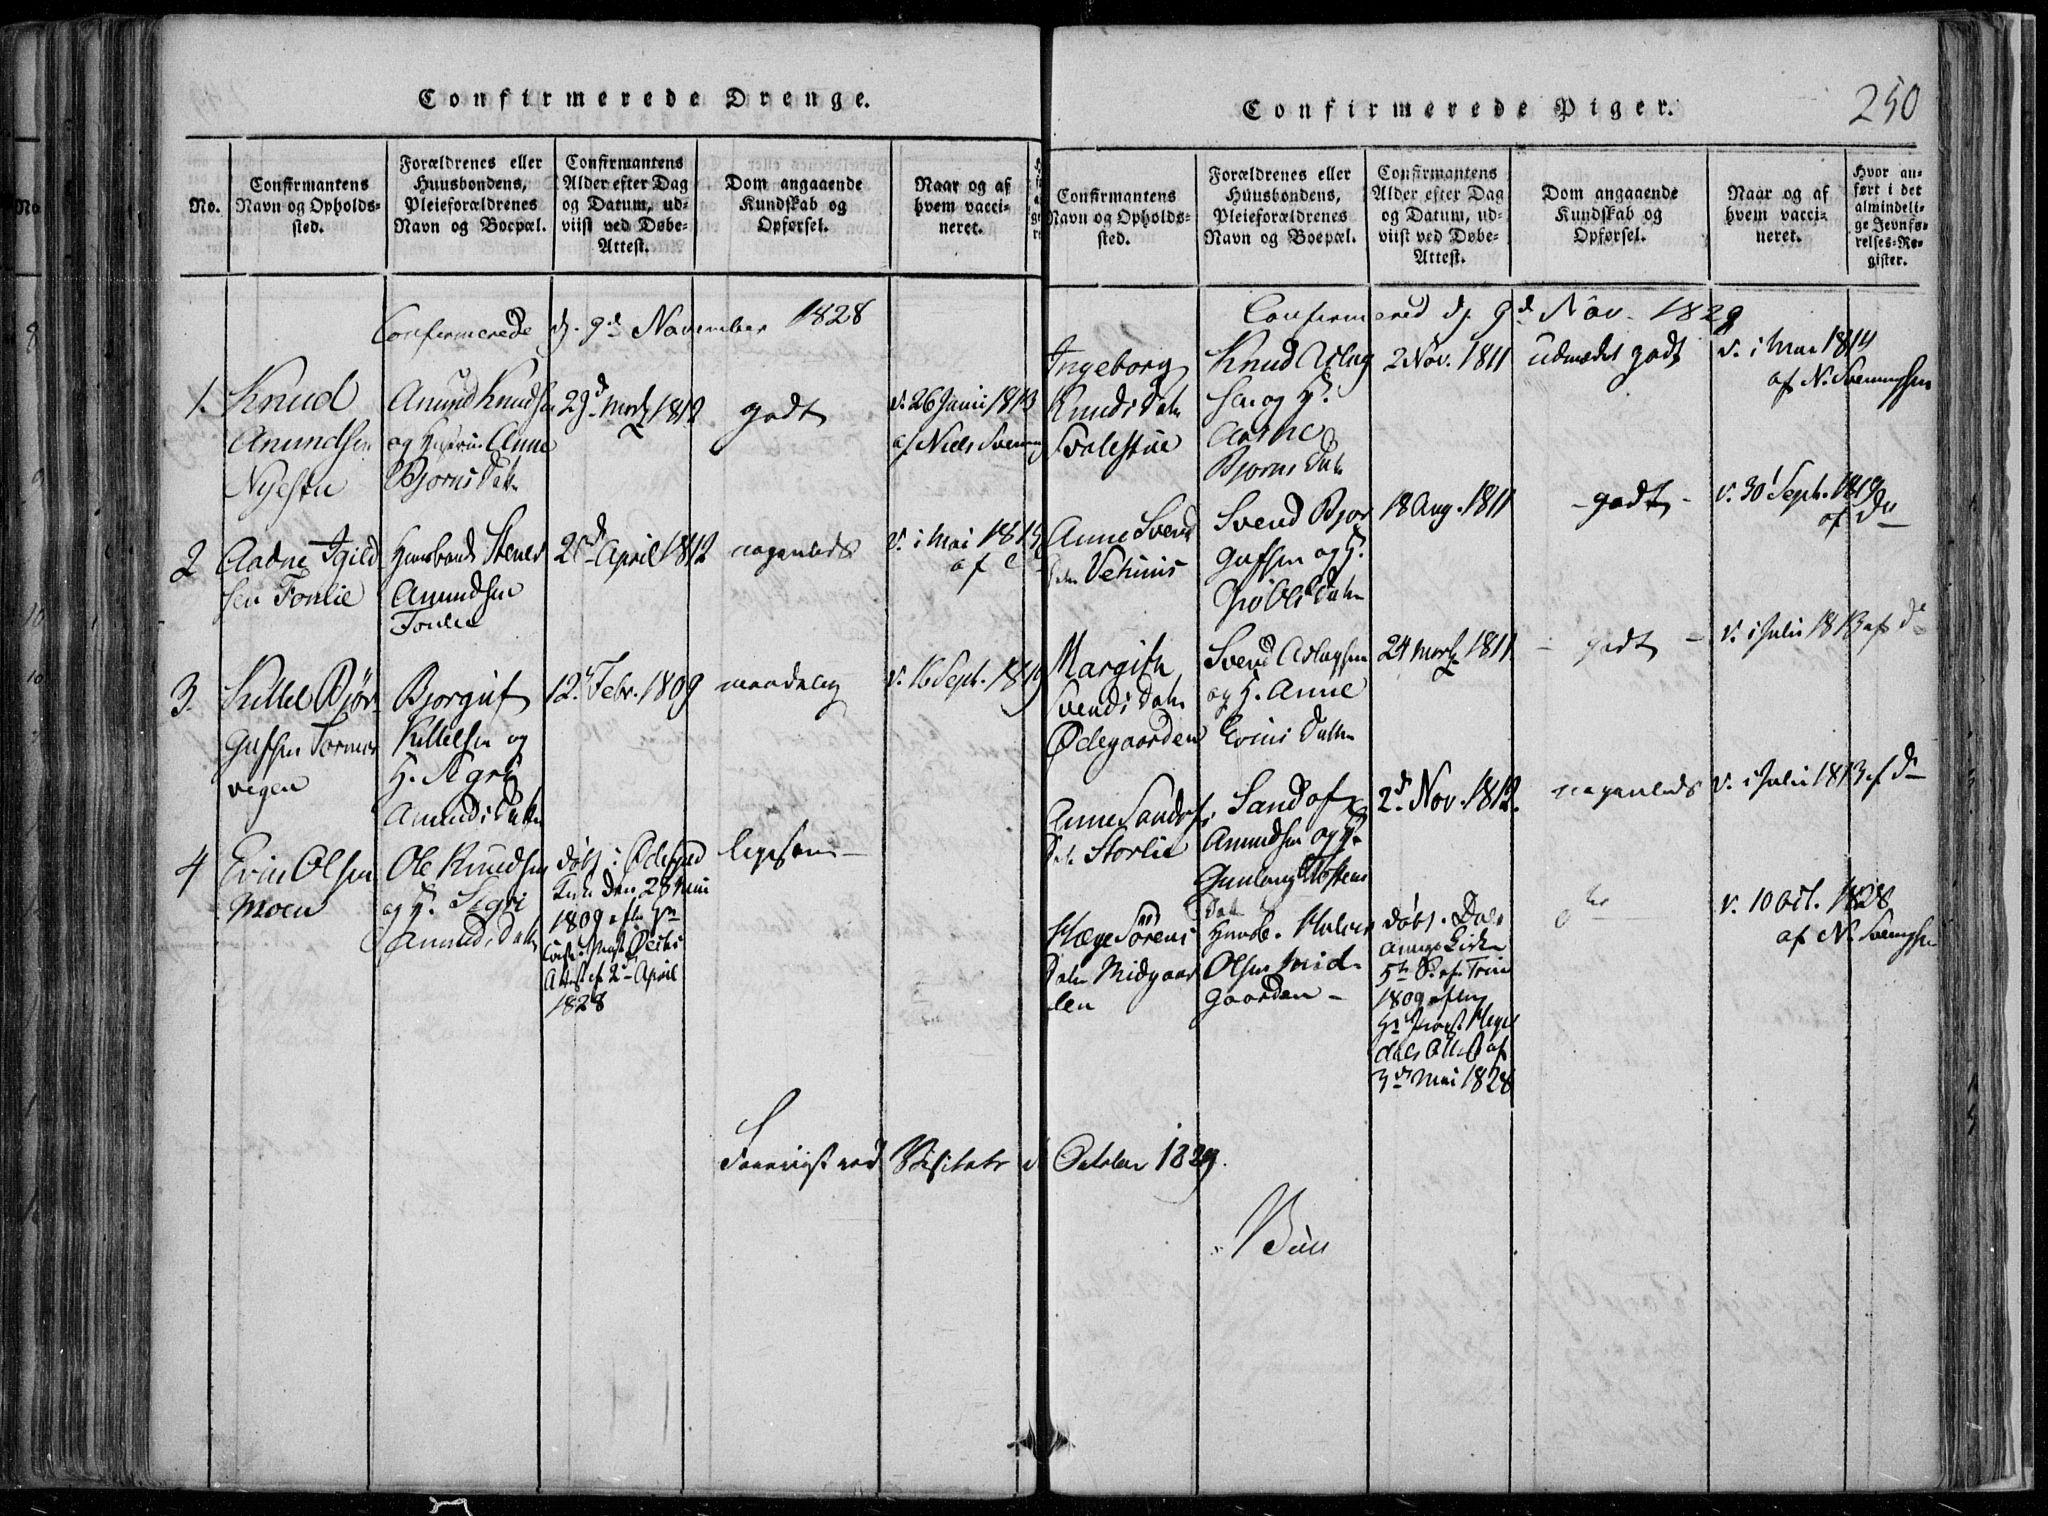 SAKO, Rauland kirkebøker, F/Fa/L0001: Ministerialbok nr. 1, 1814-1859, s. 250